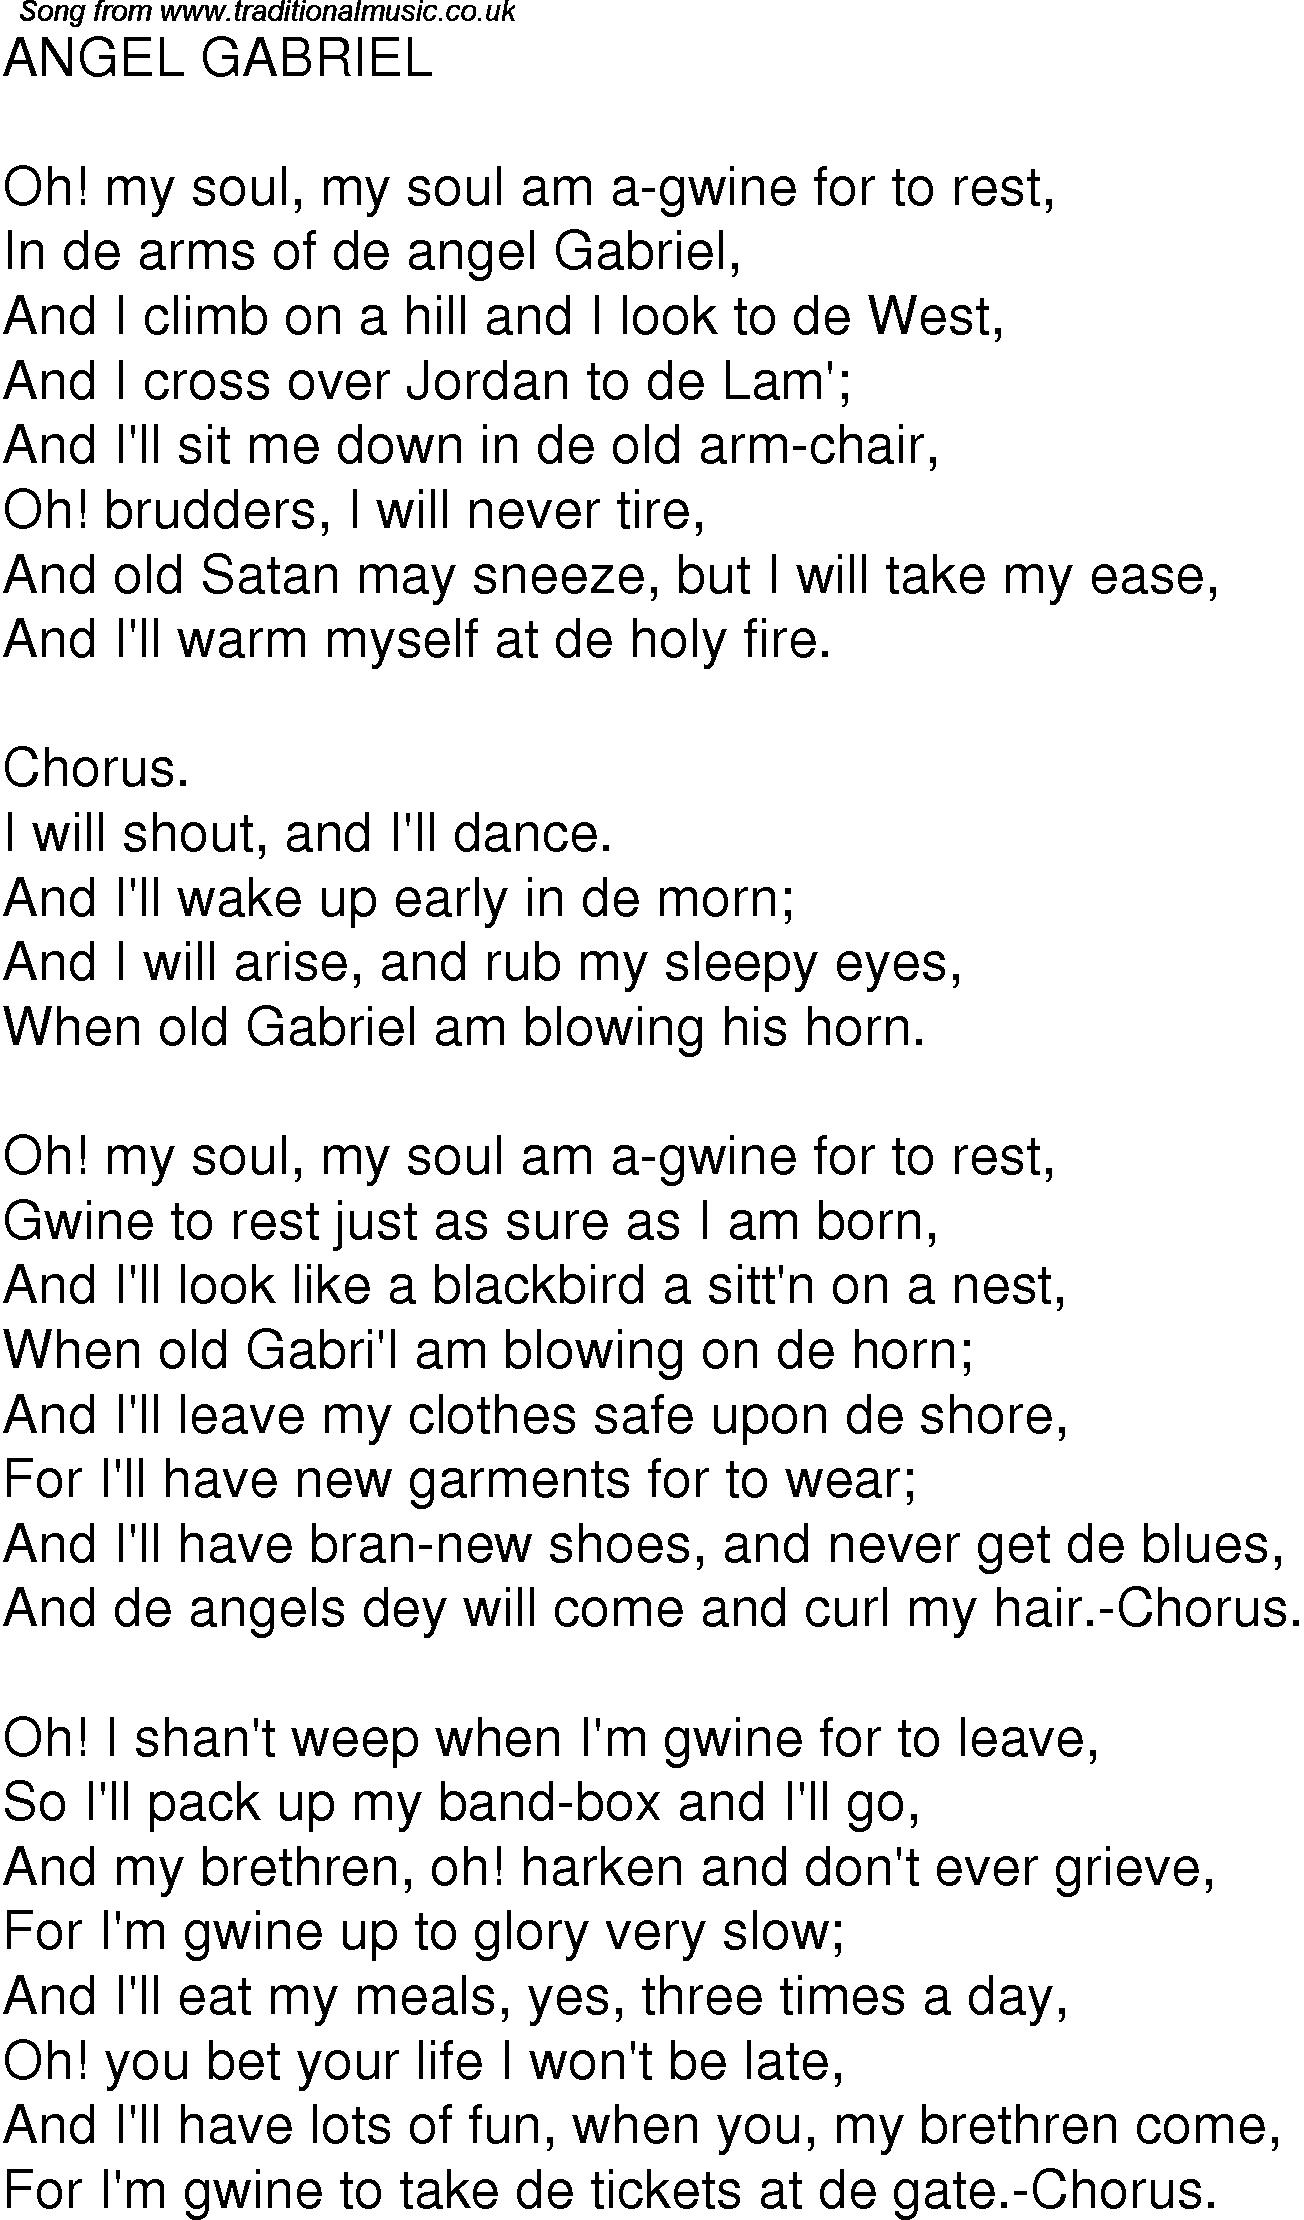 Old Time Song Lyrics For 02 Angel Gabriel